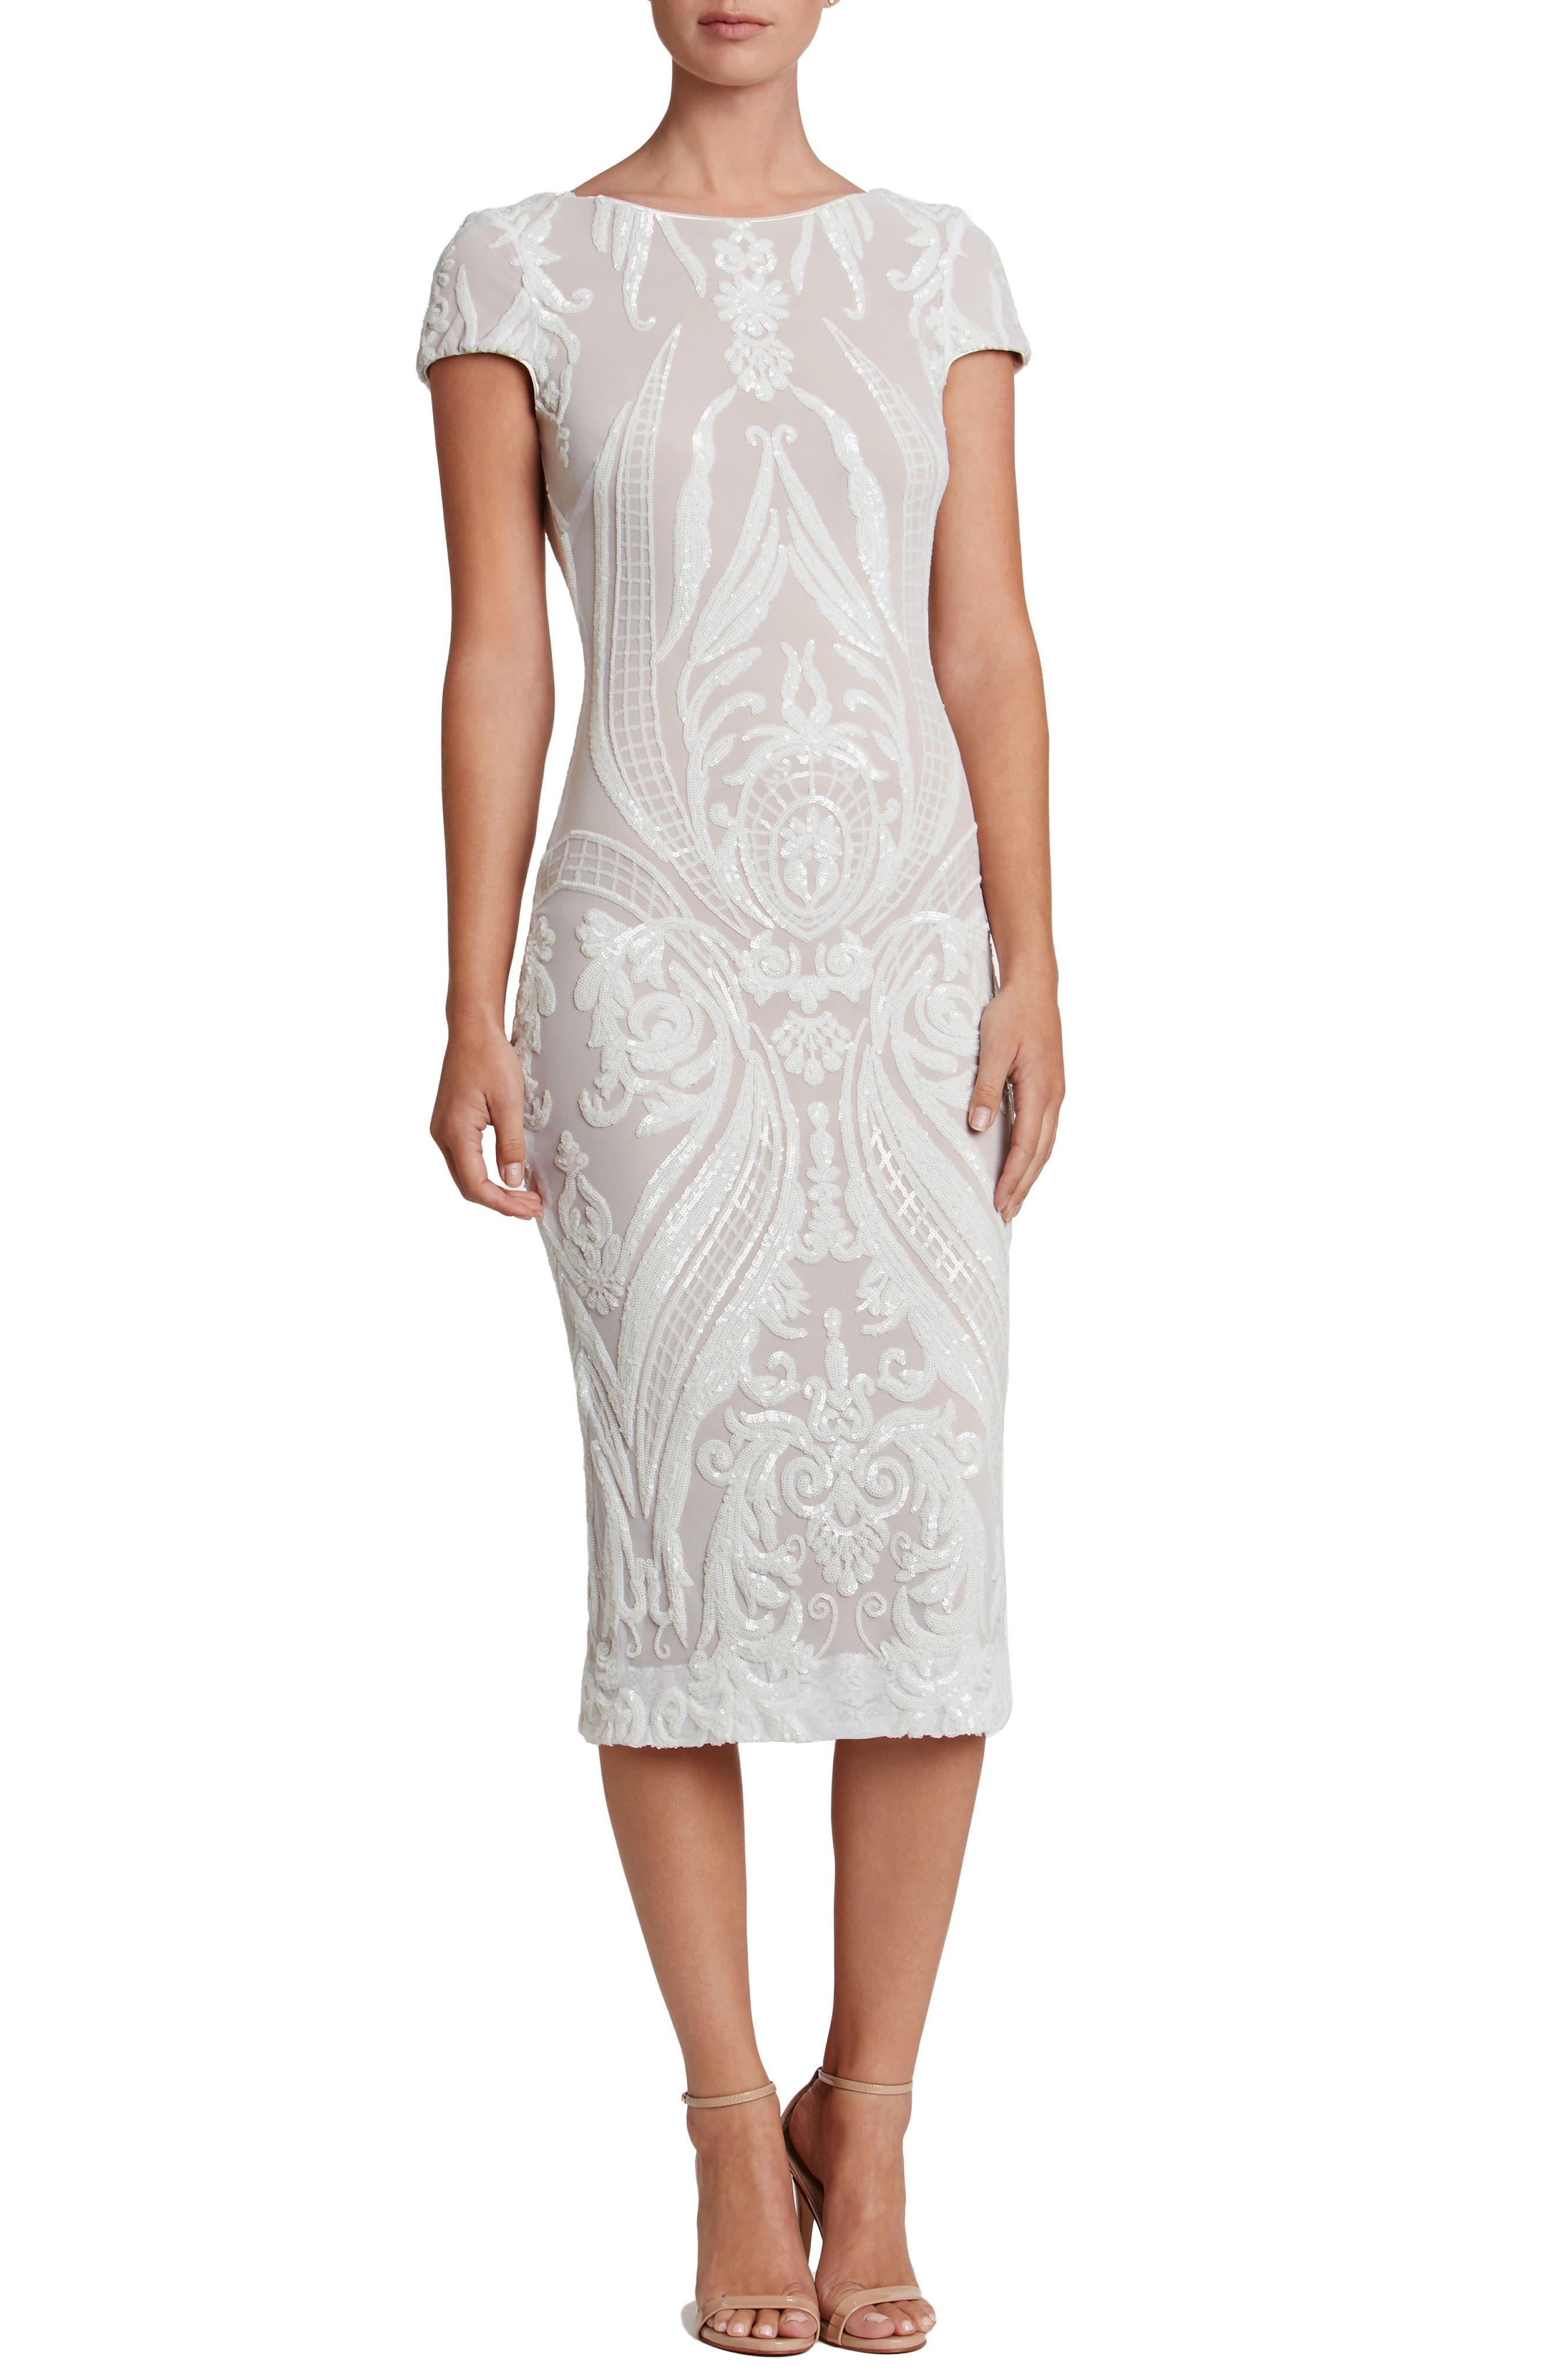 Main Image - Dress the Population Brandi Sequin Body-Con Dress